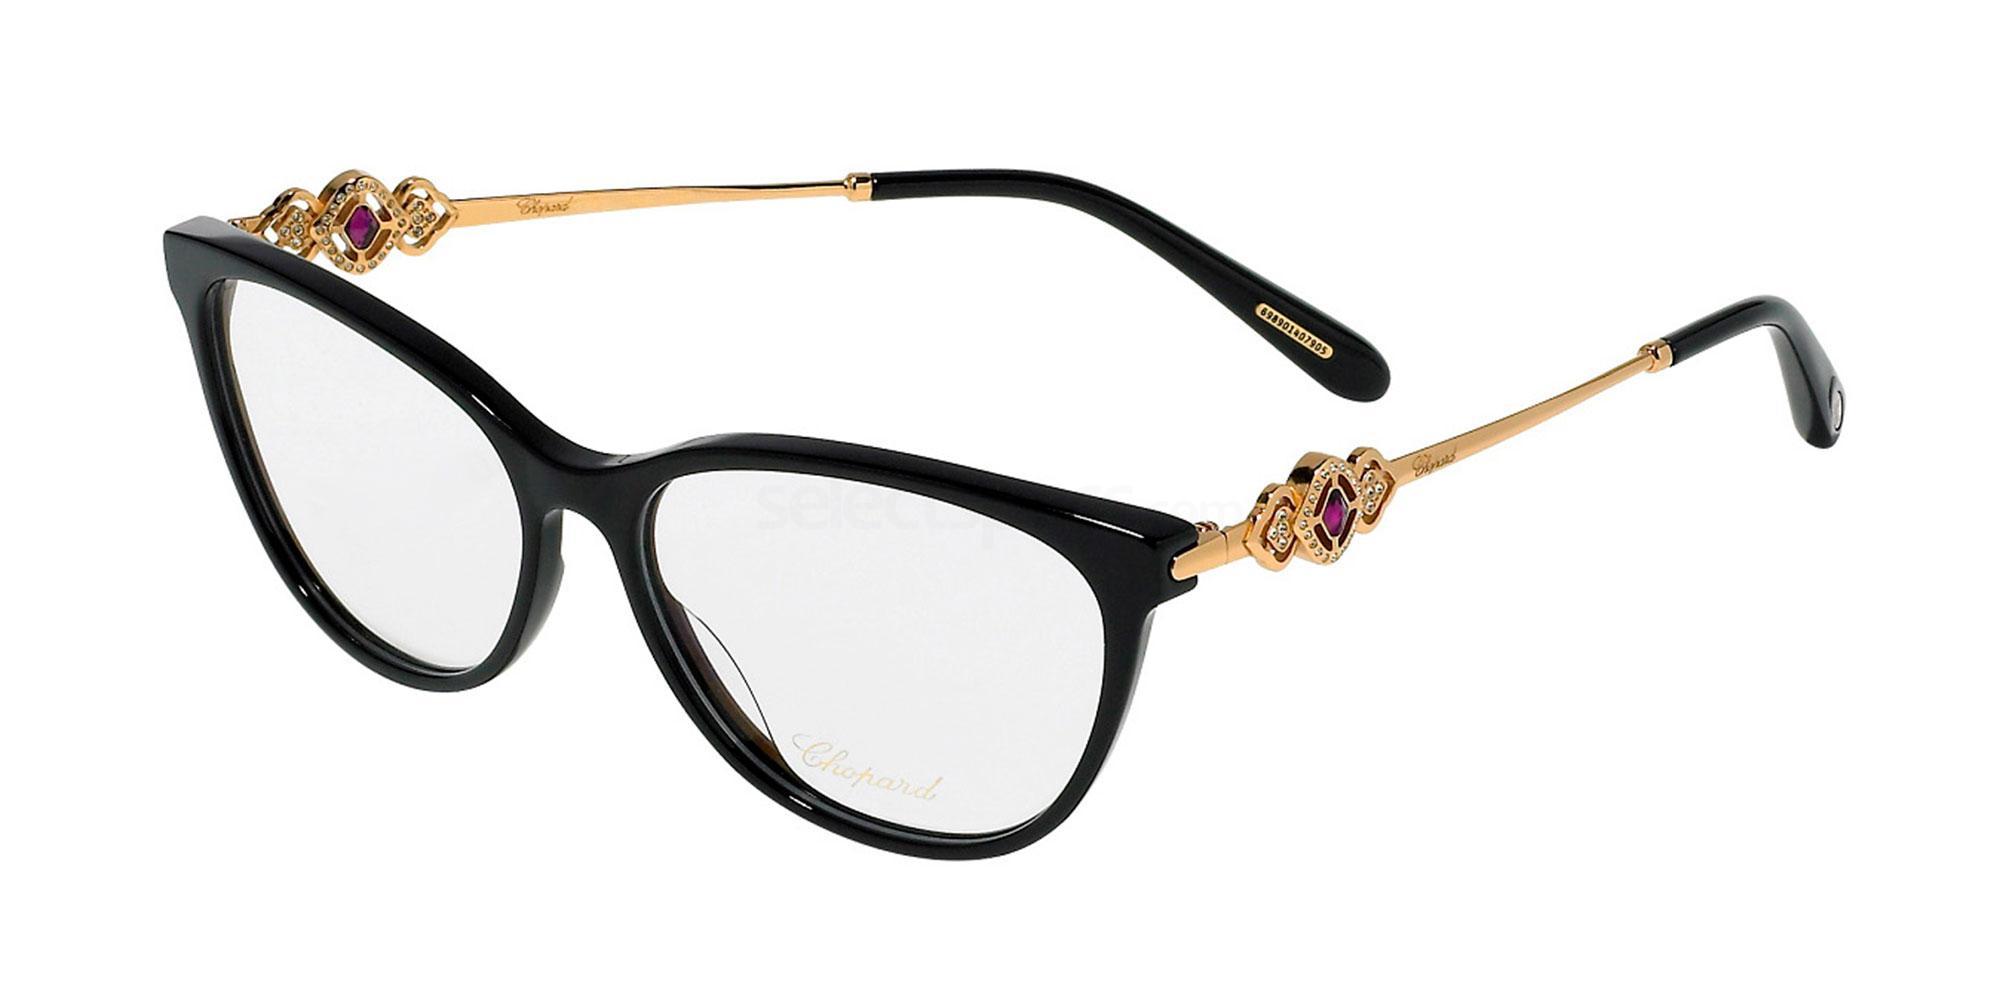 0700 VCH265S Glasses, Chopard